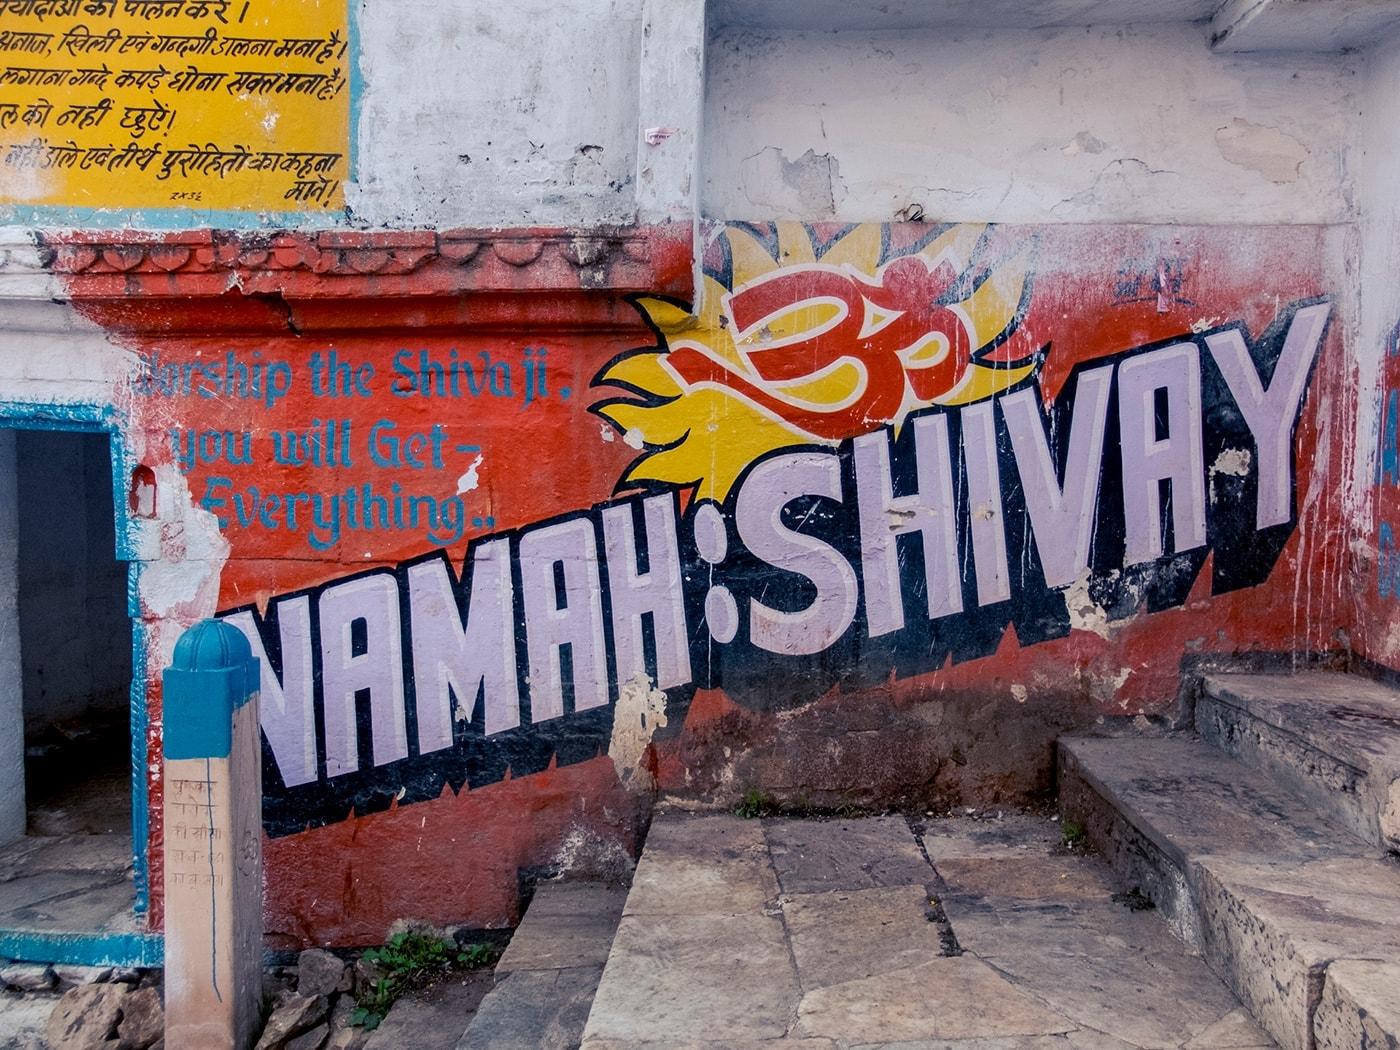 cultura indiana pushkar shivaismo